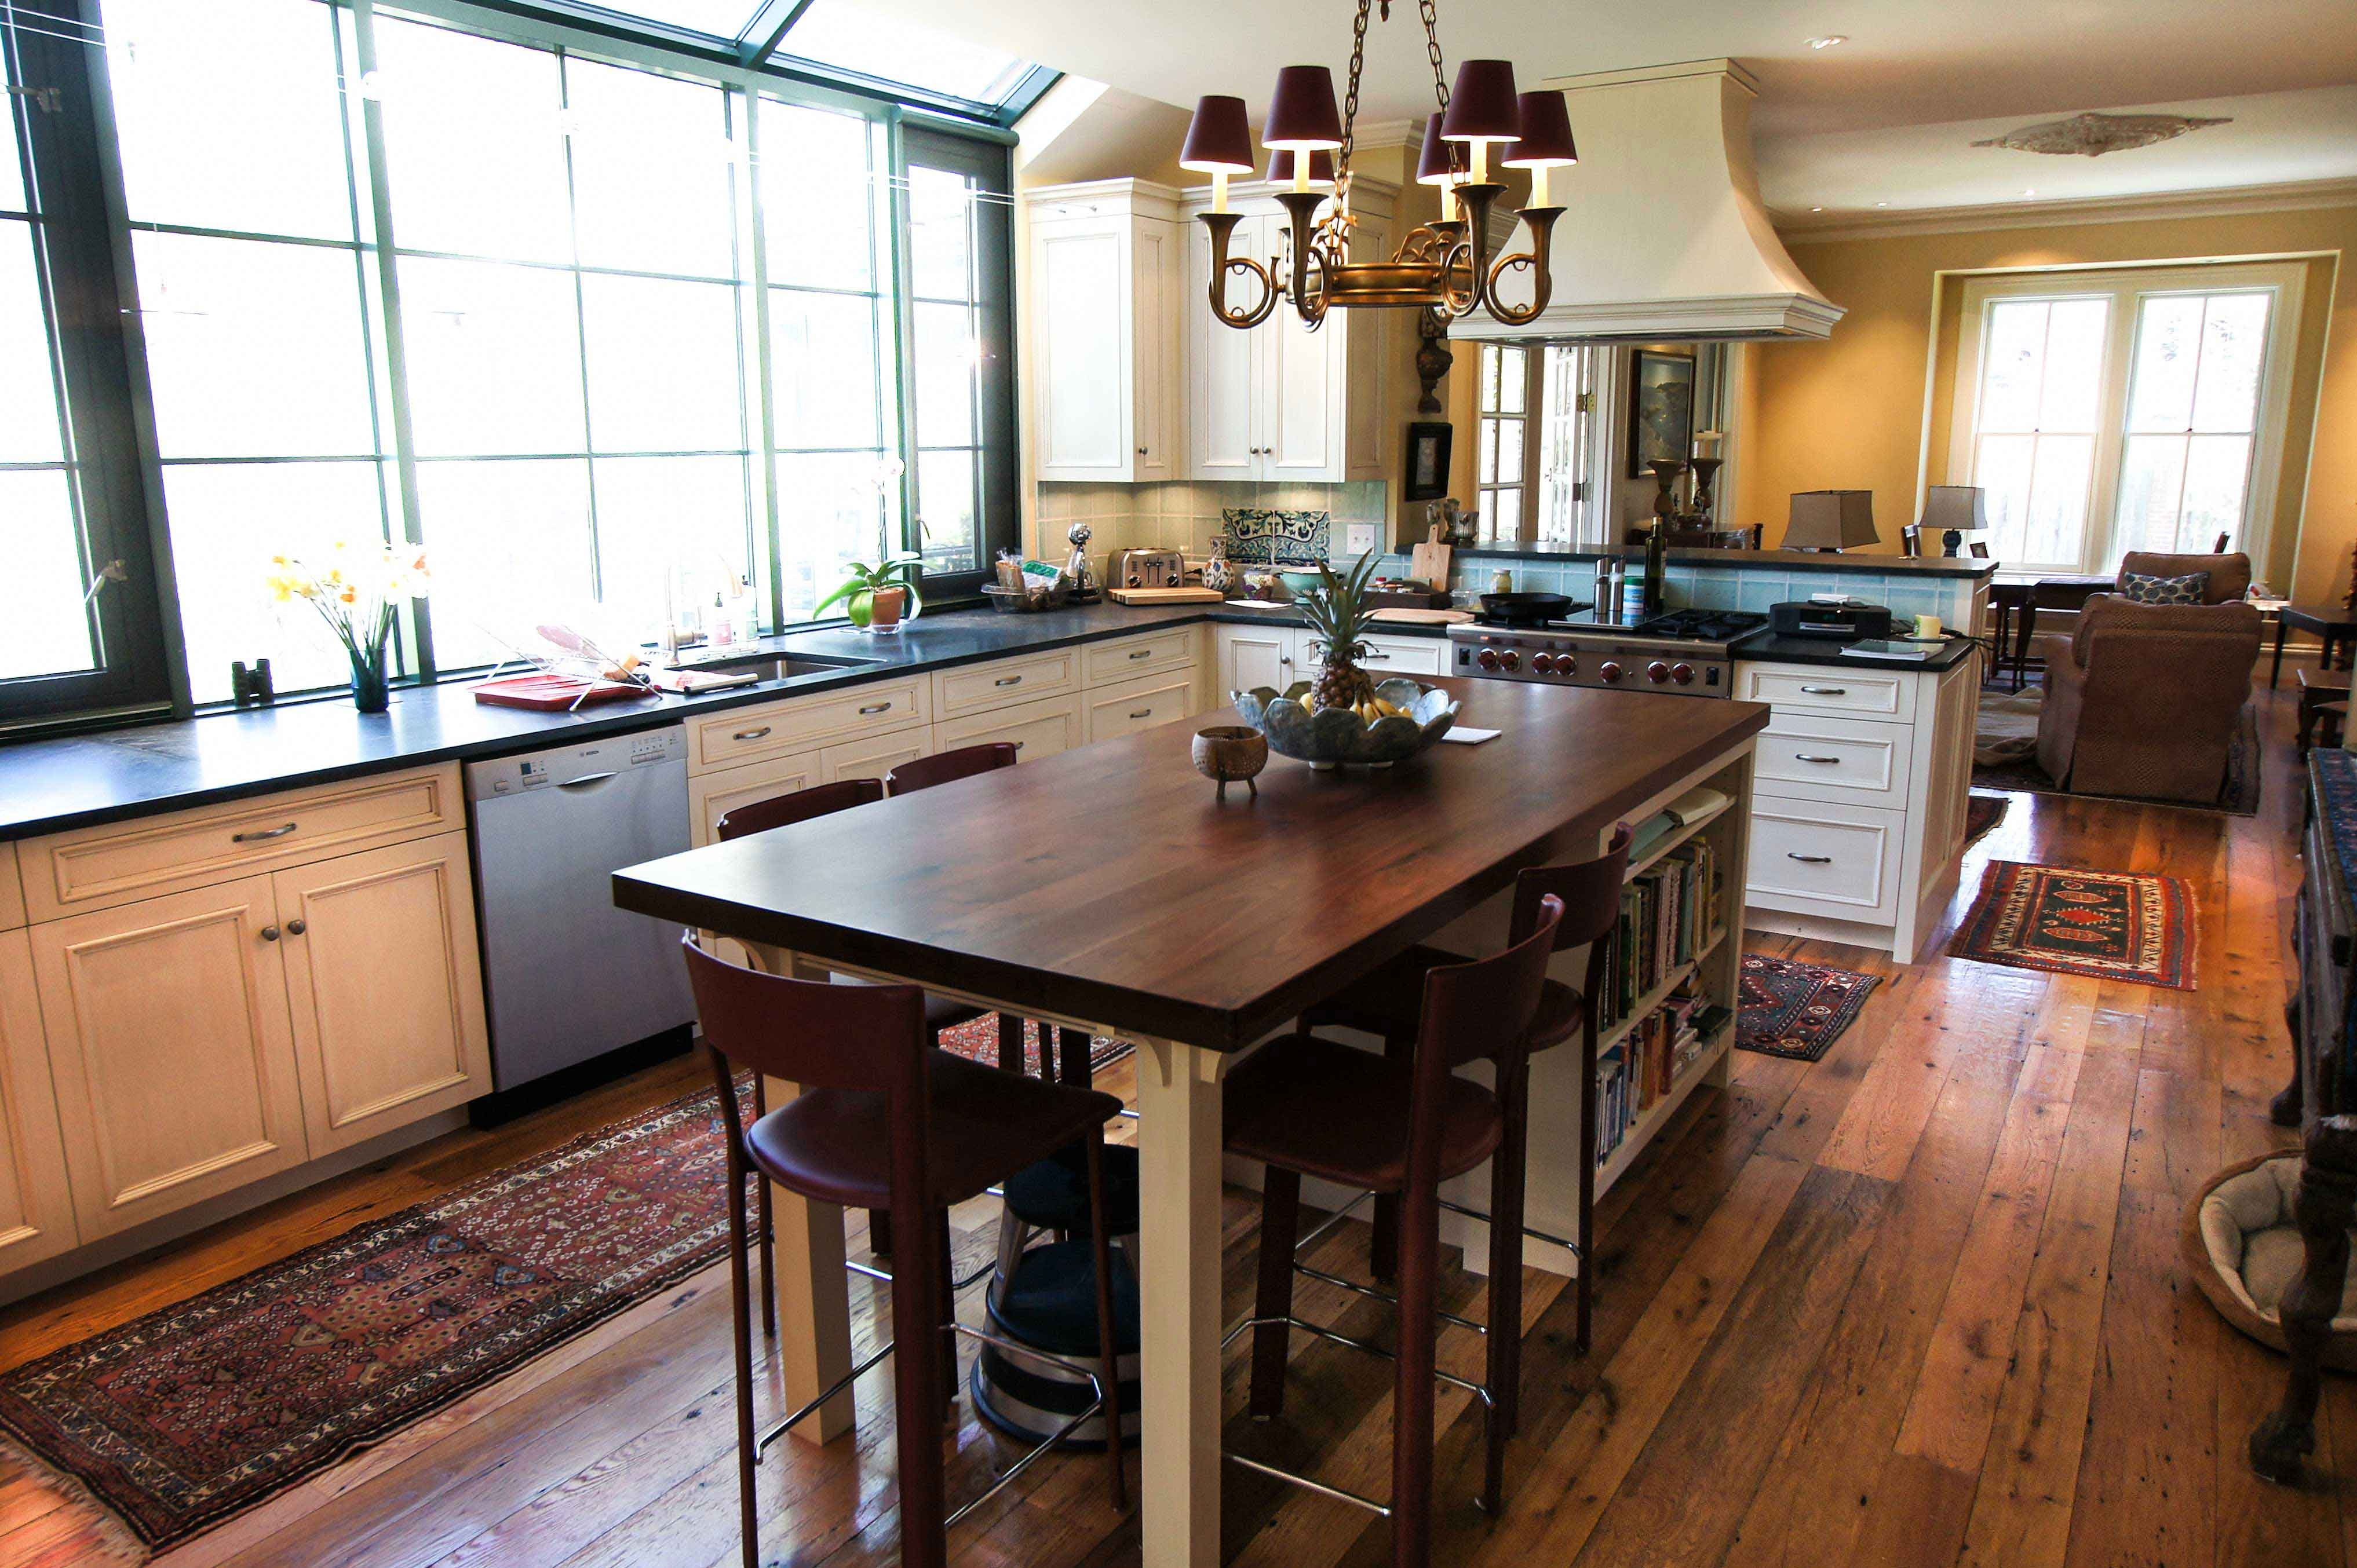 5 kitchen island dapur minimalis